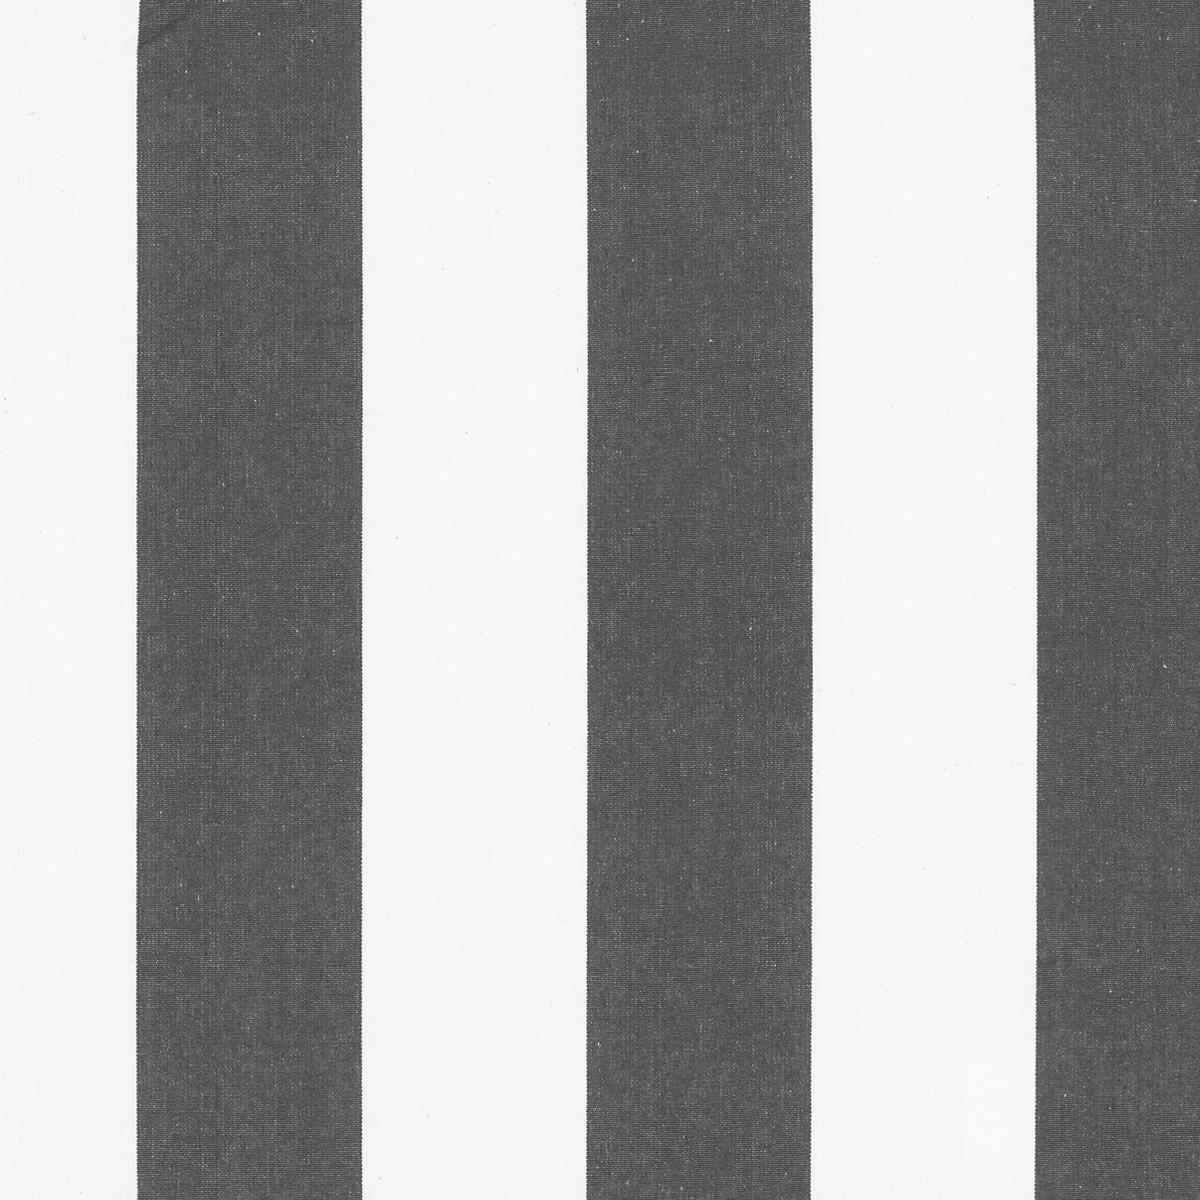 Alex Shale Fabric